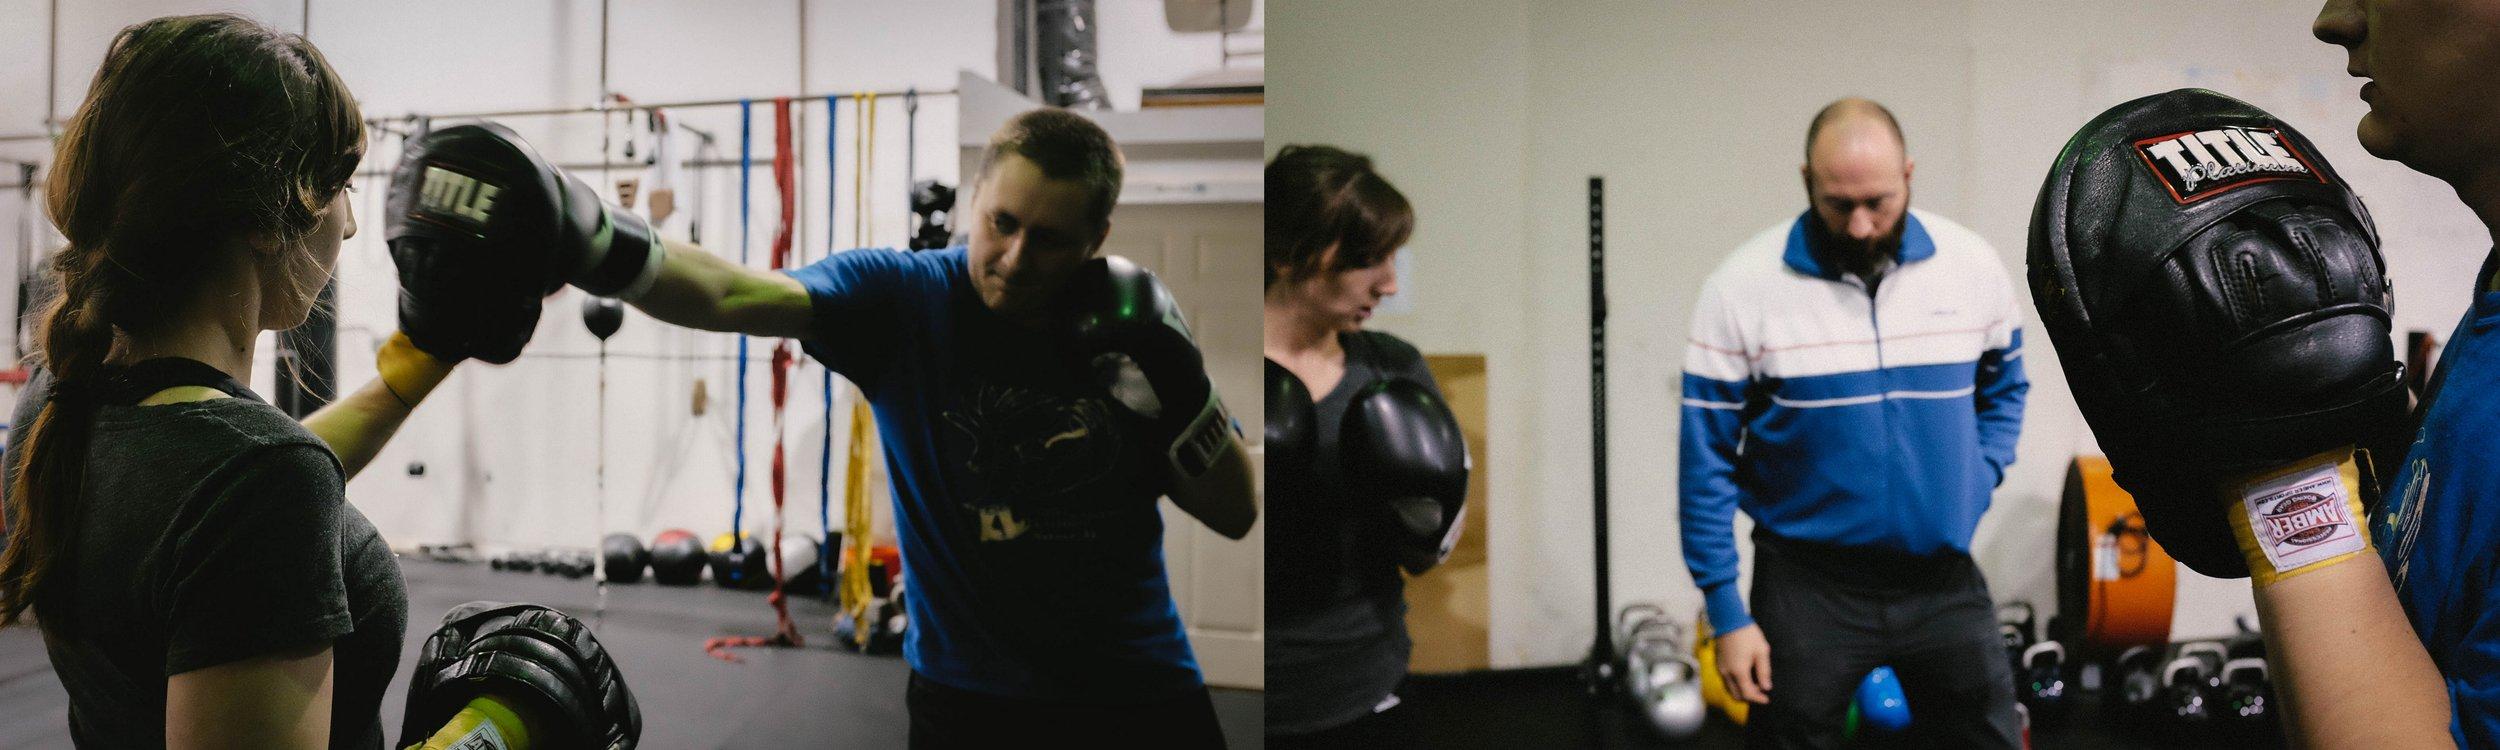 Ballard Boxing1.jpg